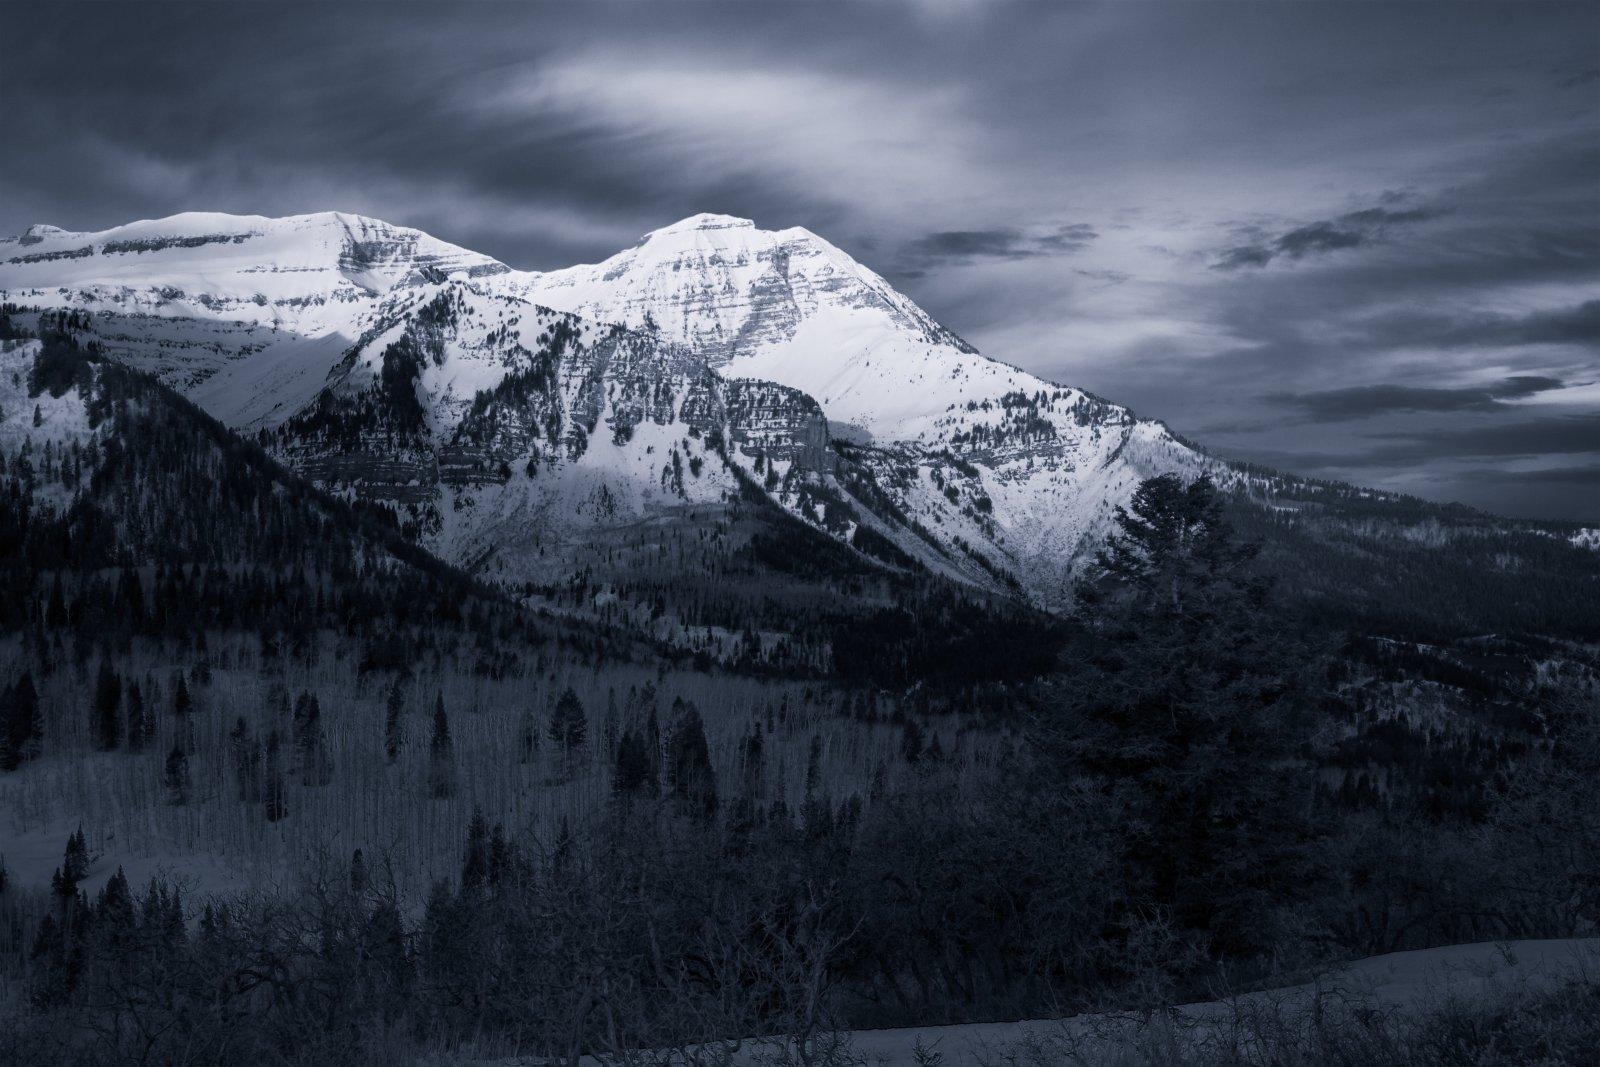 Timp Ridge Trail 4-20200222-bw.jpg